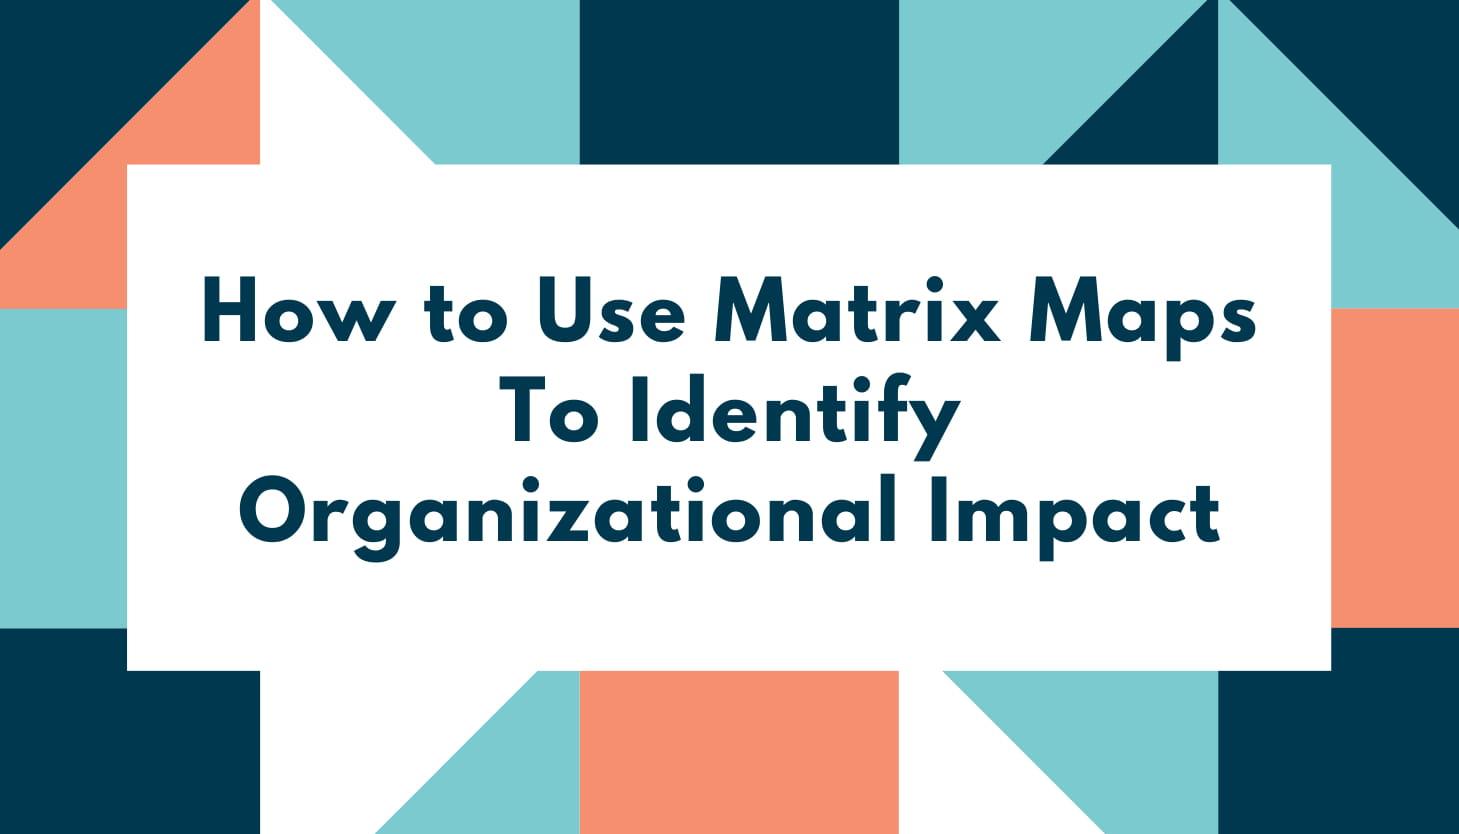 How to Use Matrix Maps To Identify Organizational Impact